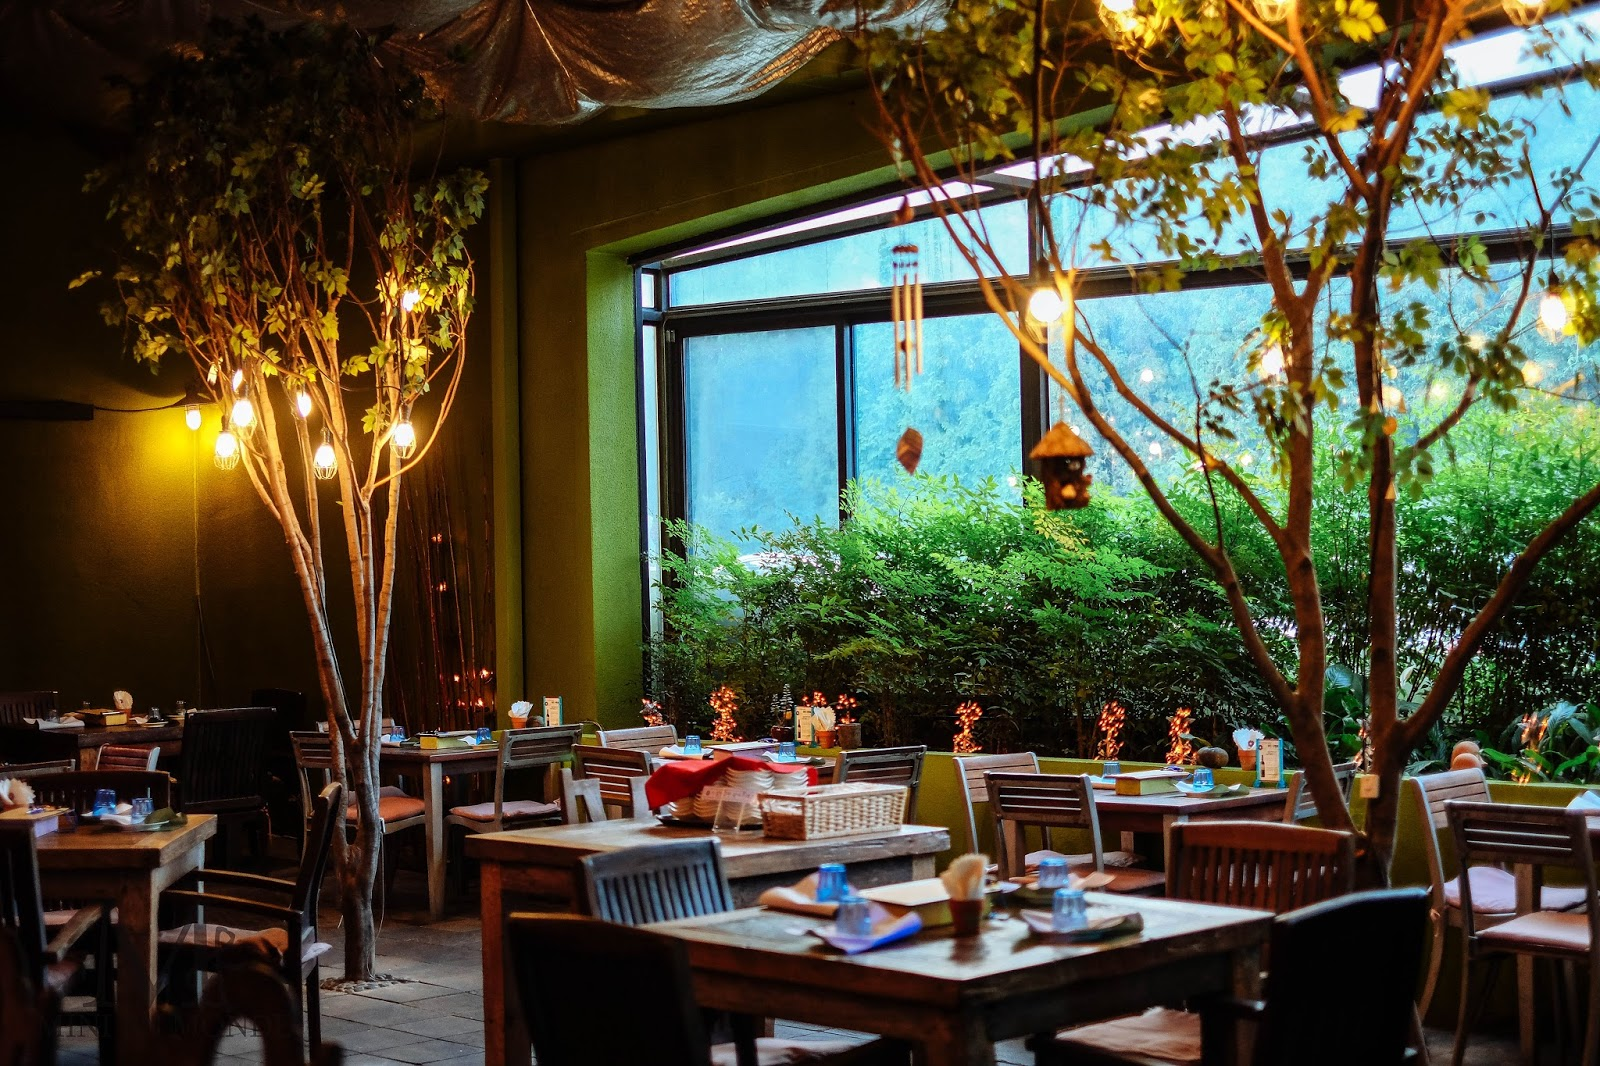 Garden concept restaurant eunice 39 s garden ggtour for Cuisine garden